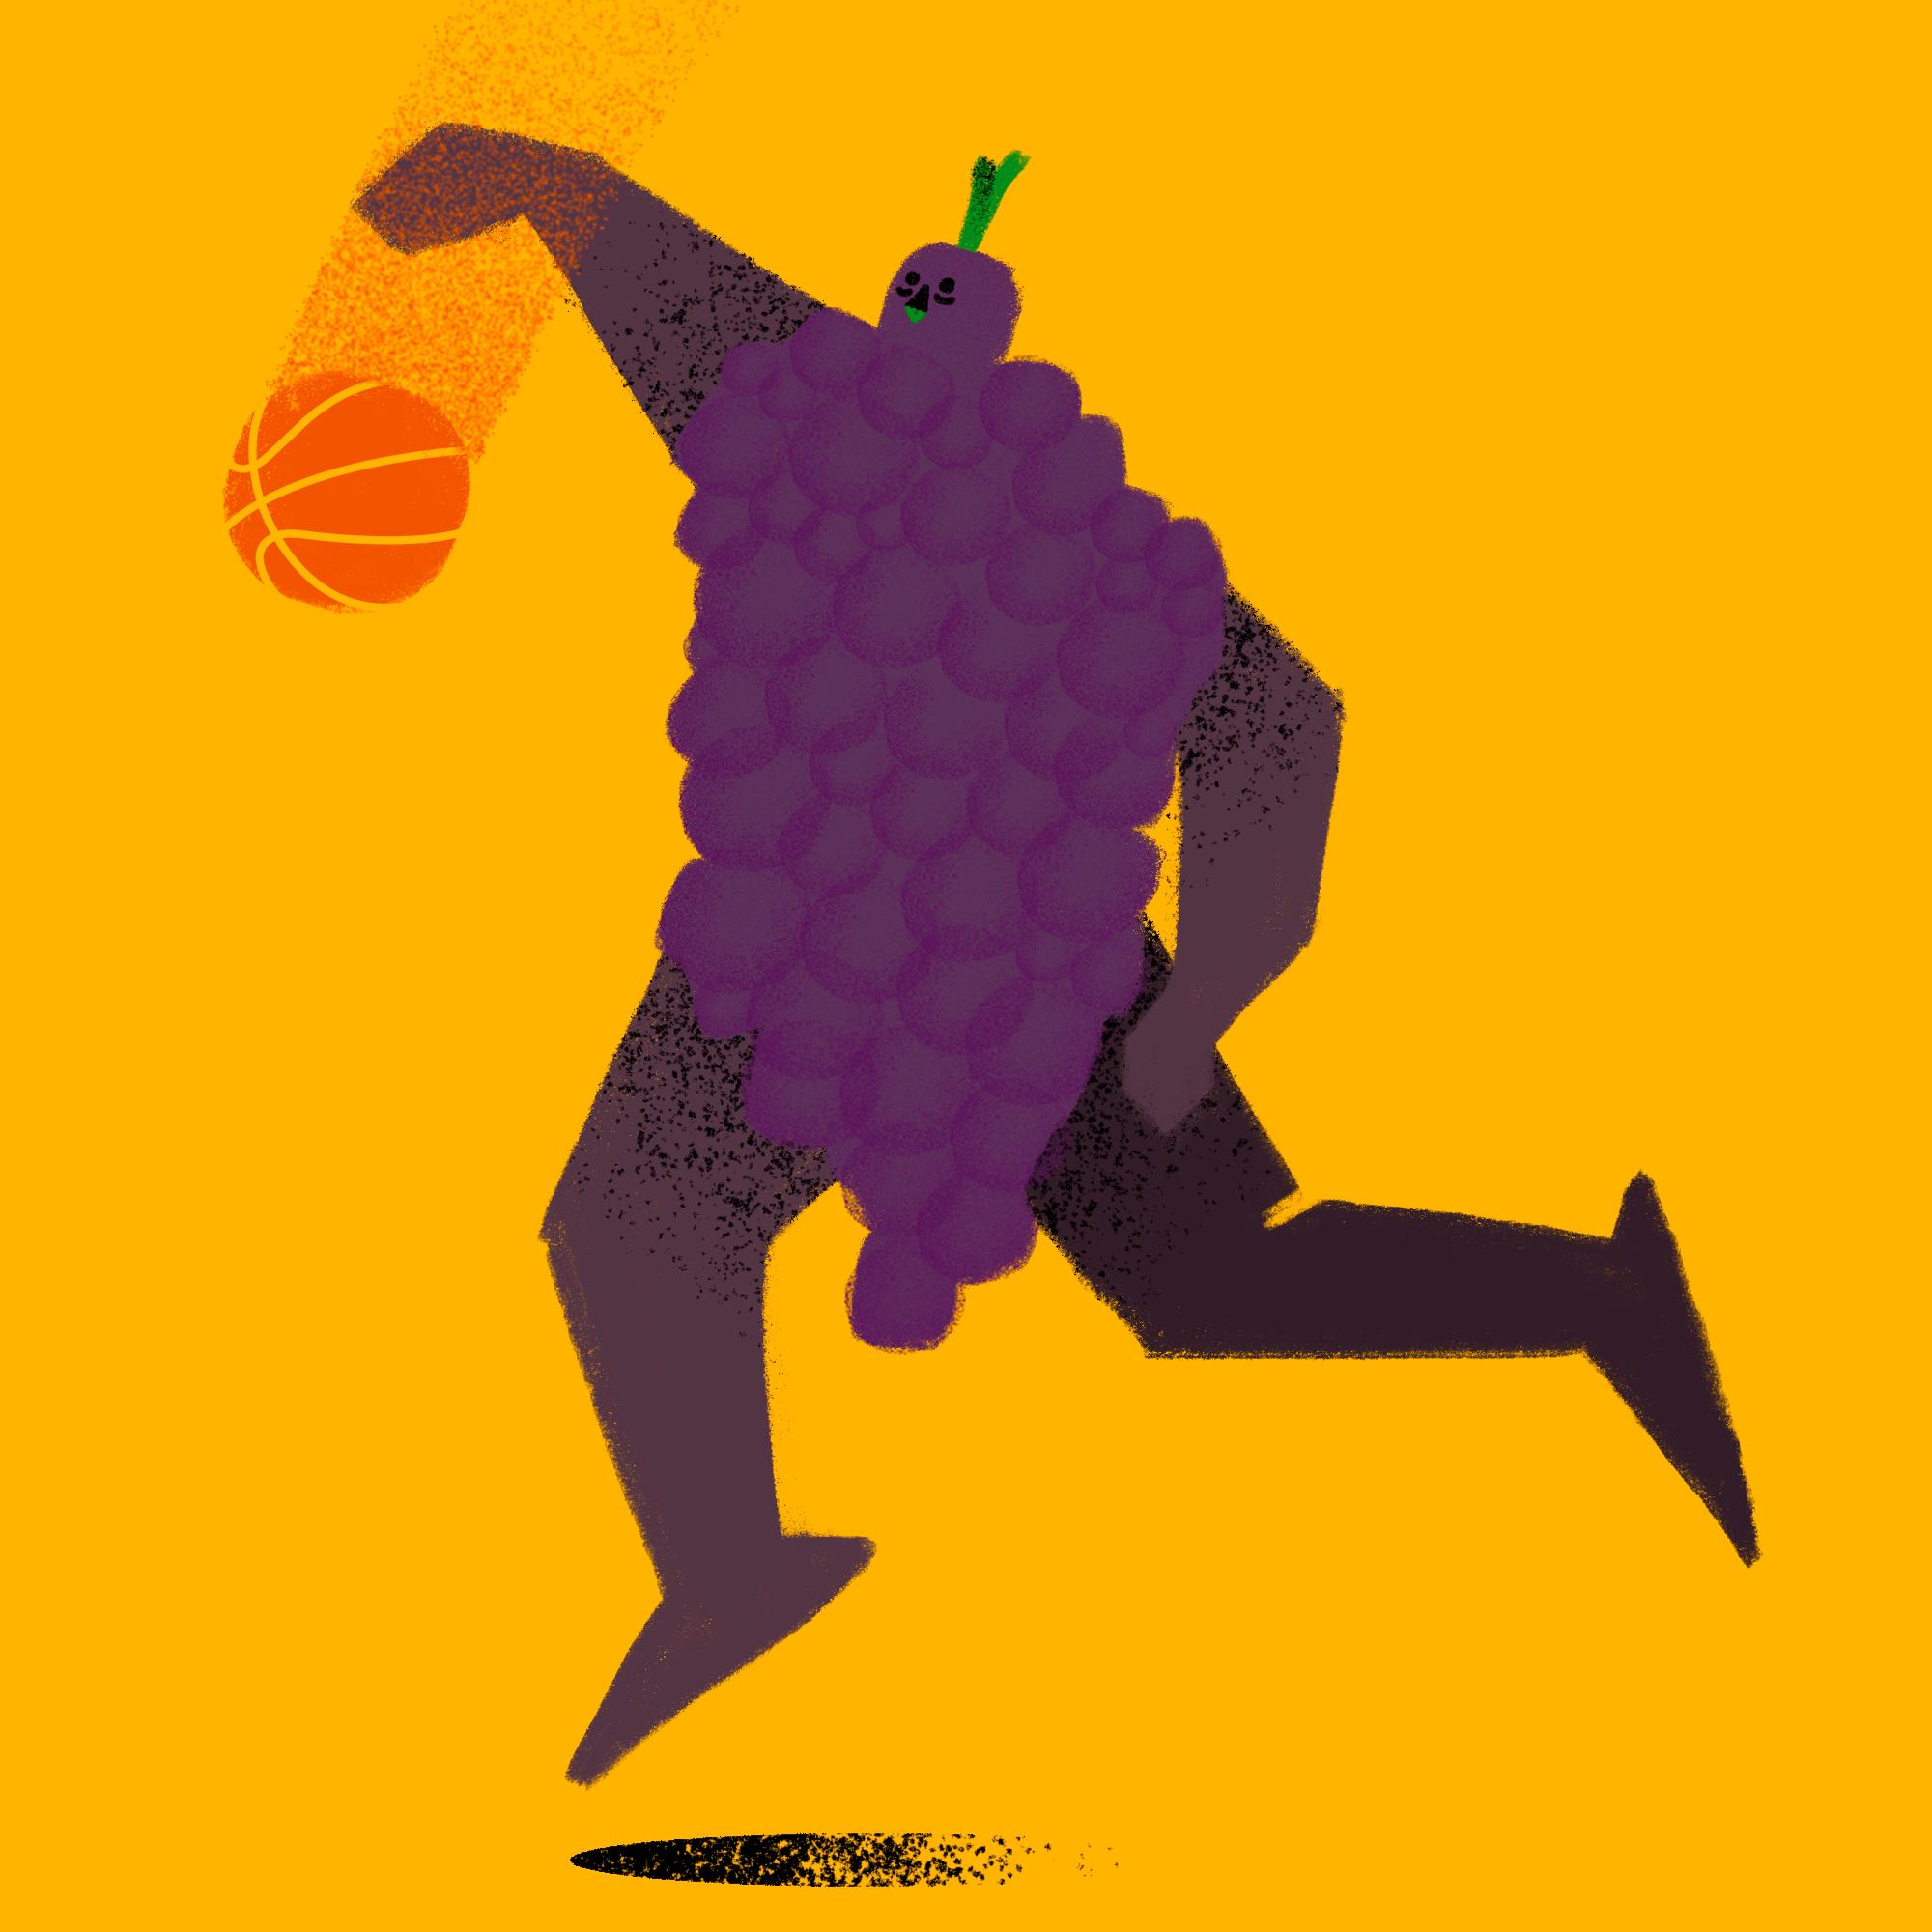 grape-guy